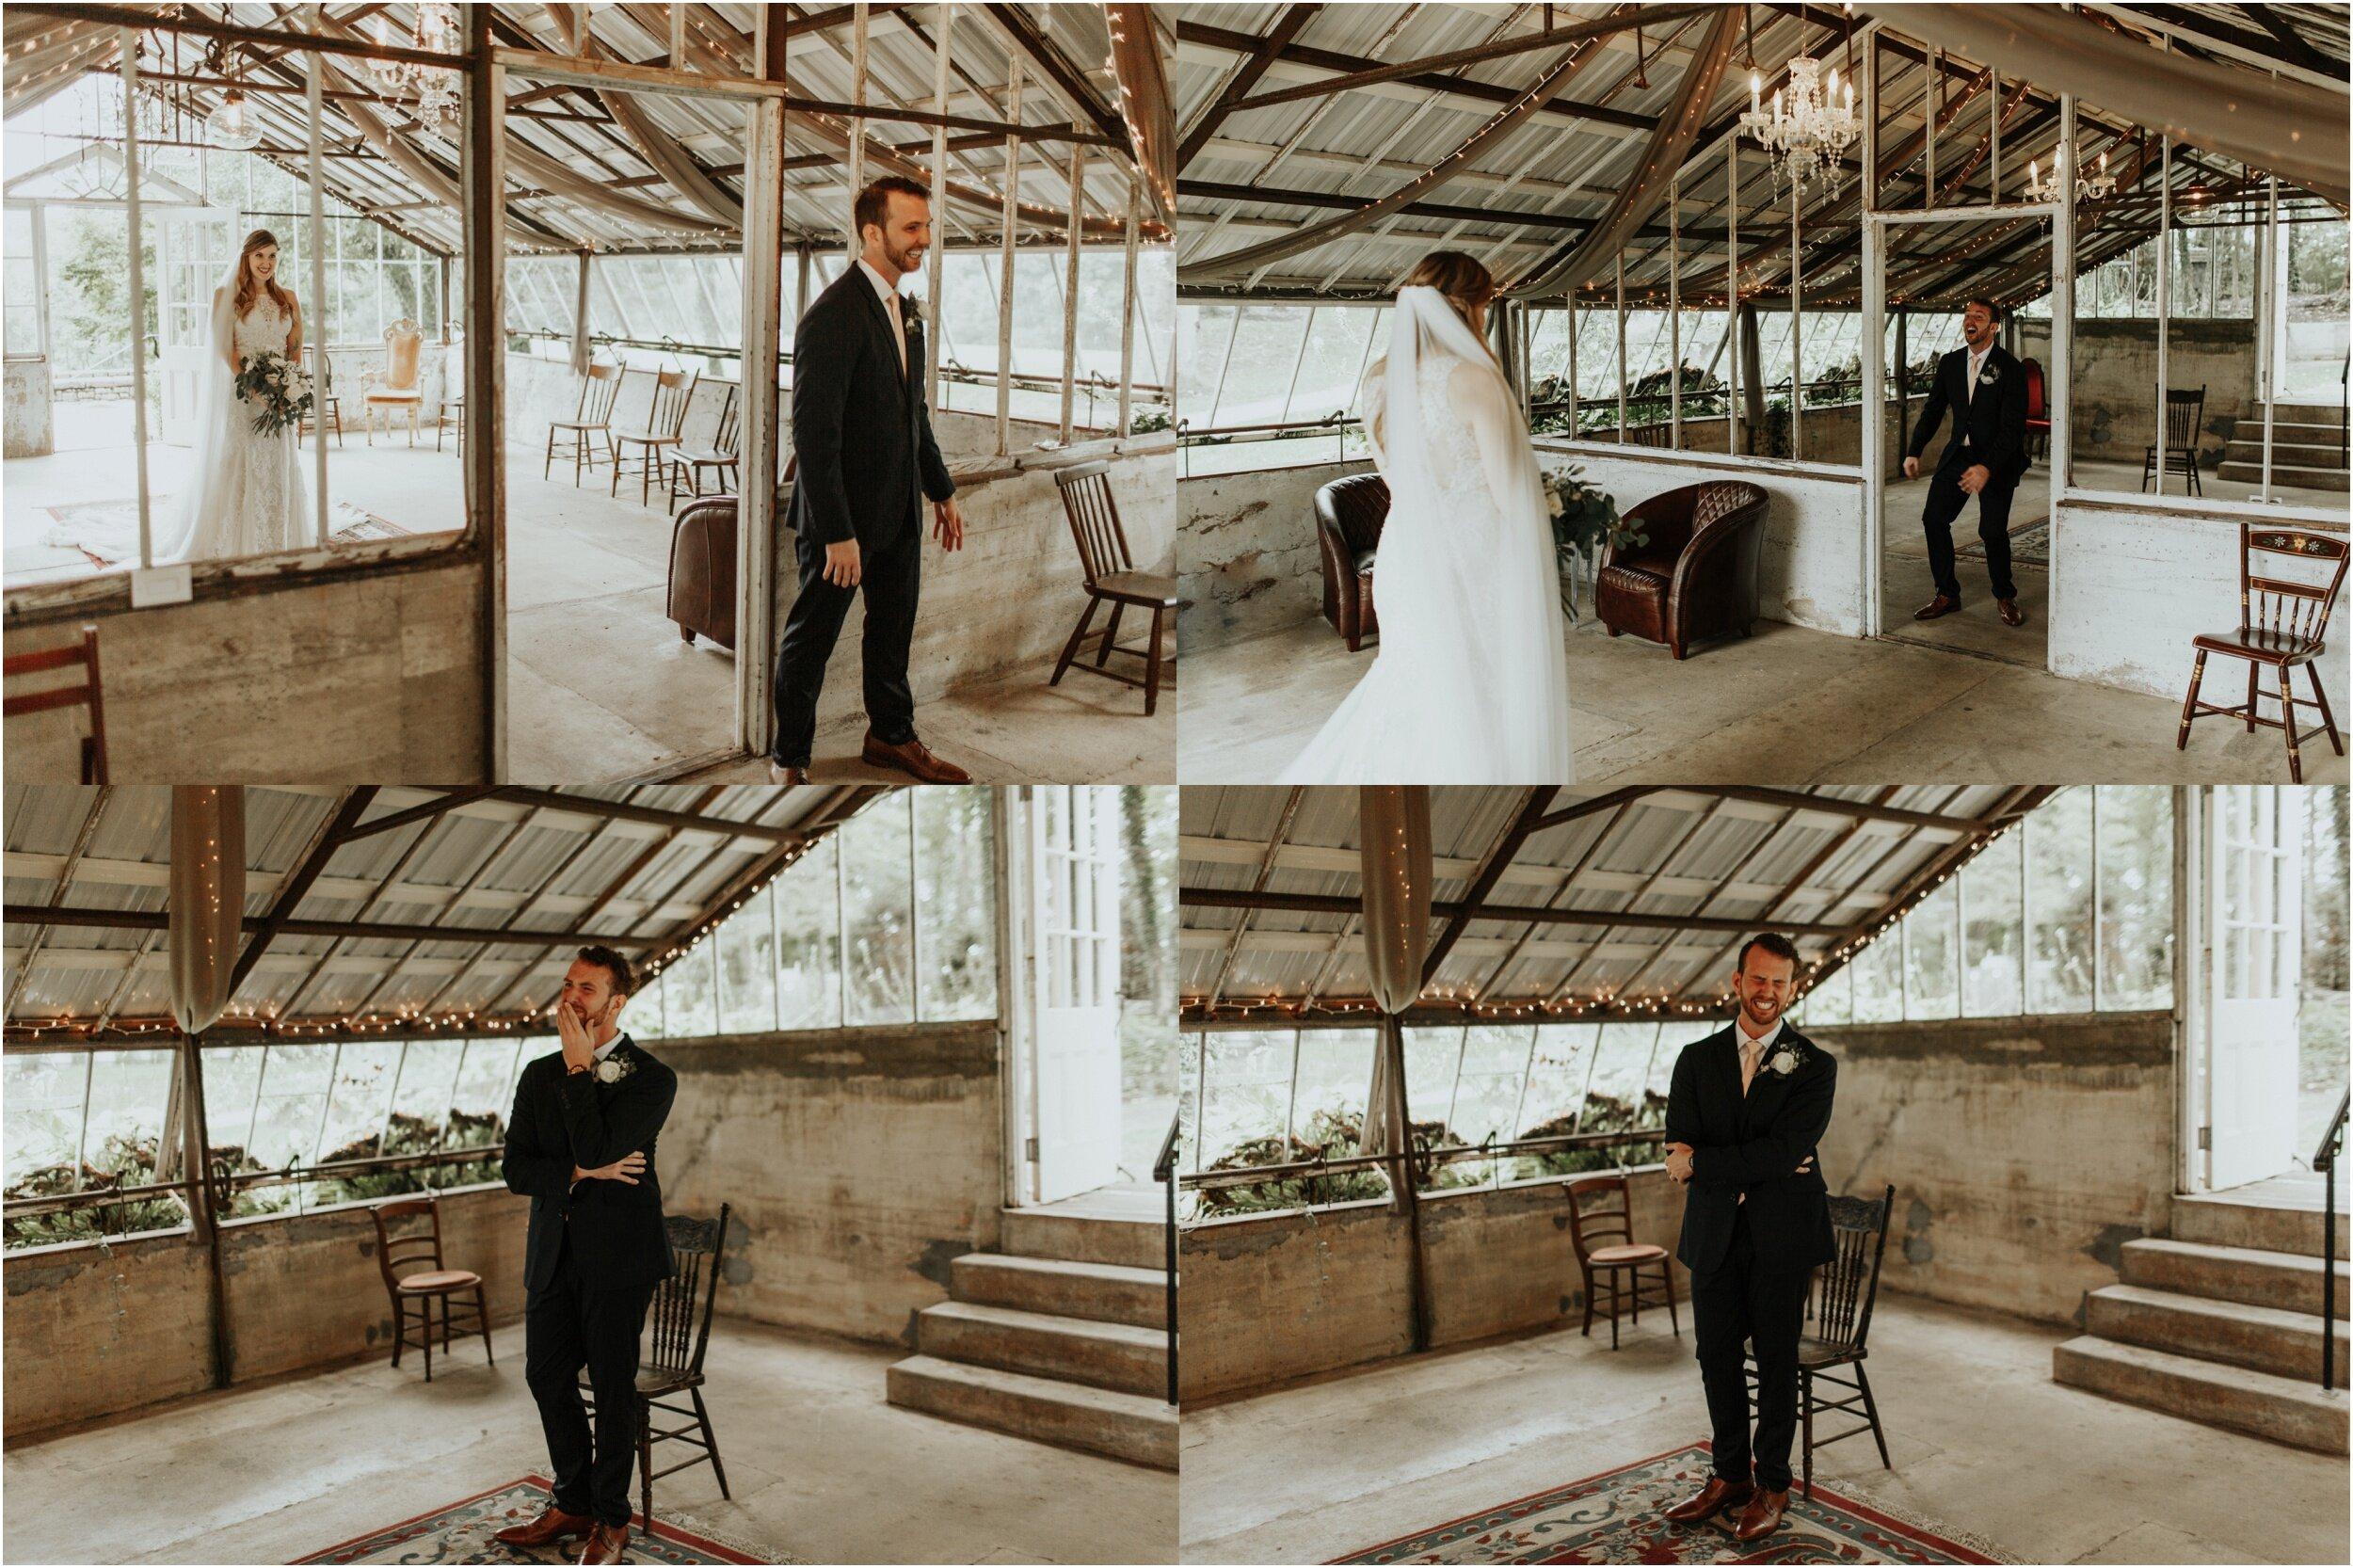 steph-and-jordan-cox-our-wedding-historic-shady-lane-compass-wedding-collective-hazel-lining-photography-destination-elopement-wedding-engagement-photography_0032.jpg